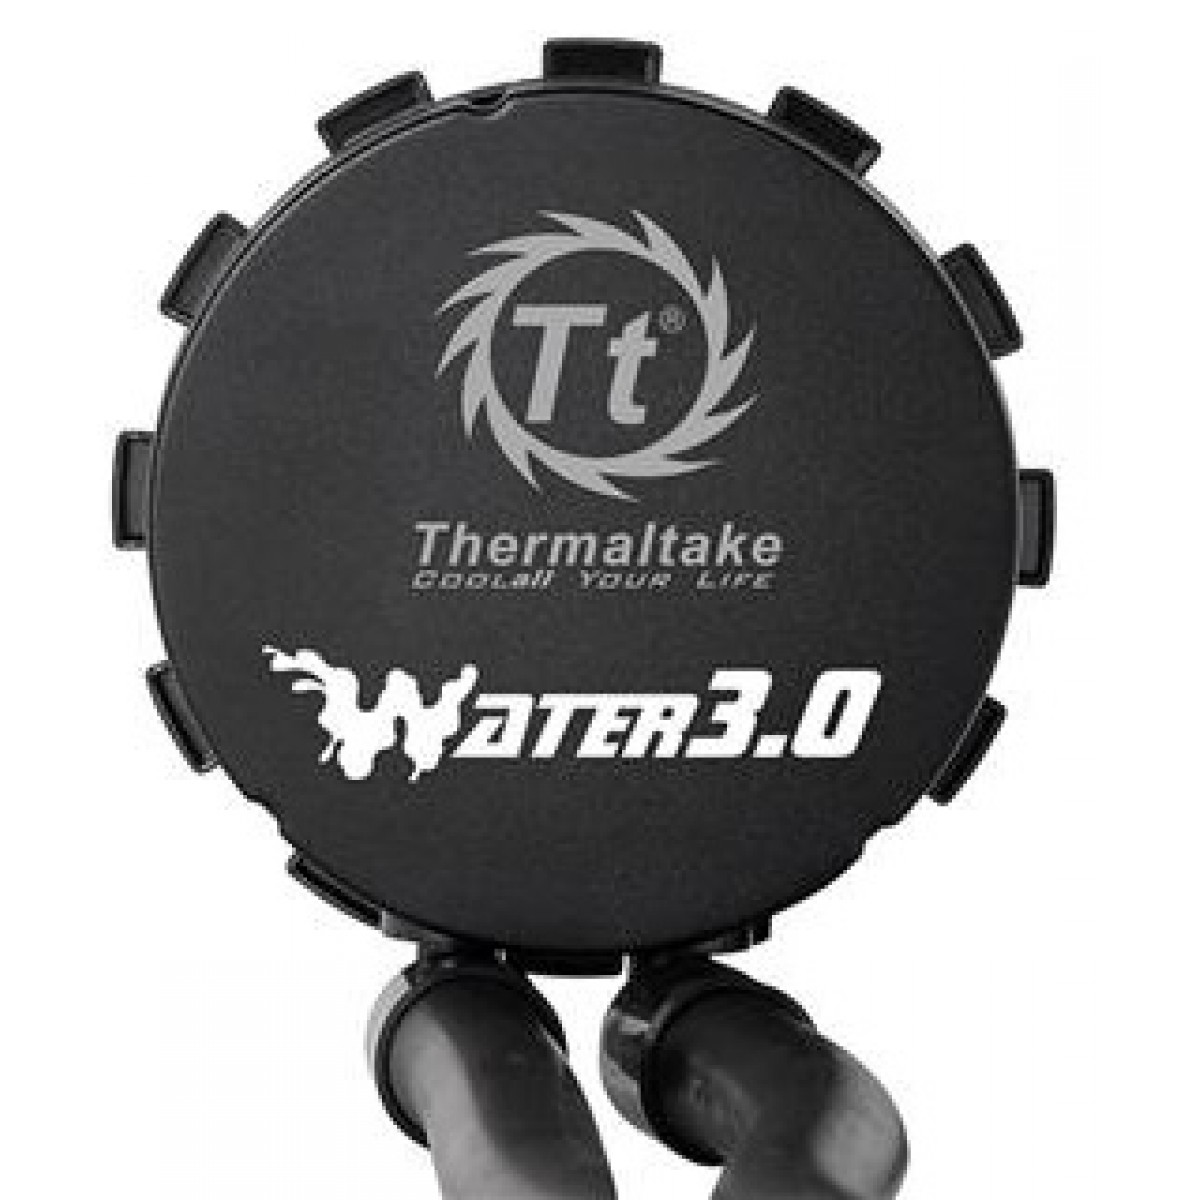 Watercooler Thermaltake Water 3.0 Performer C, CLW0222-B